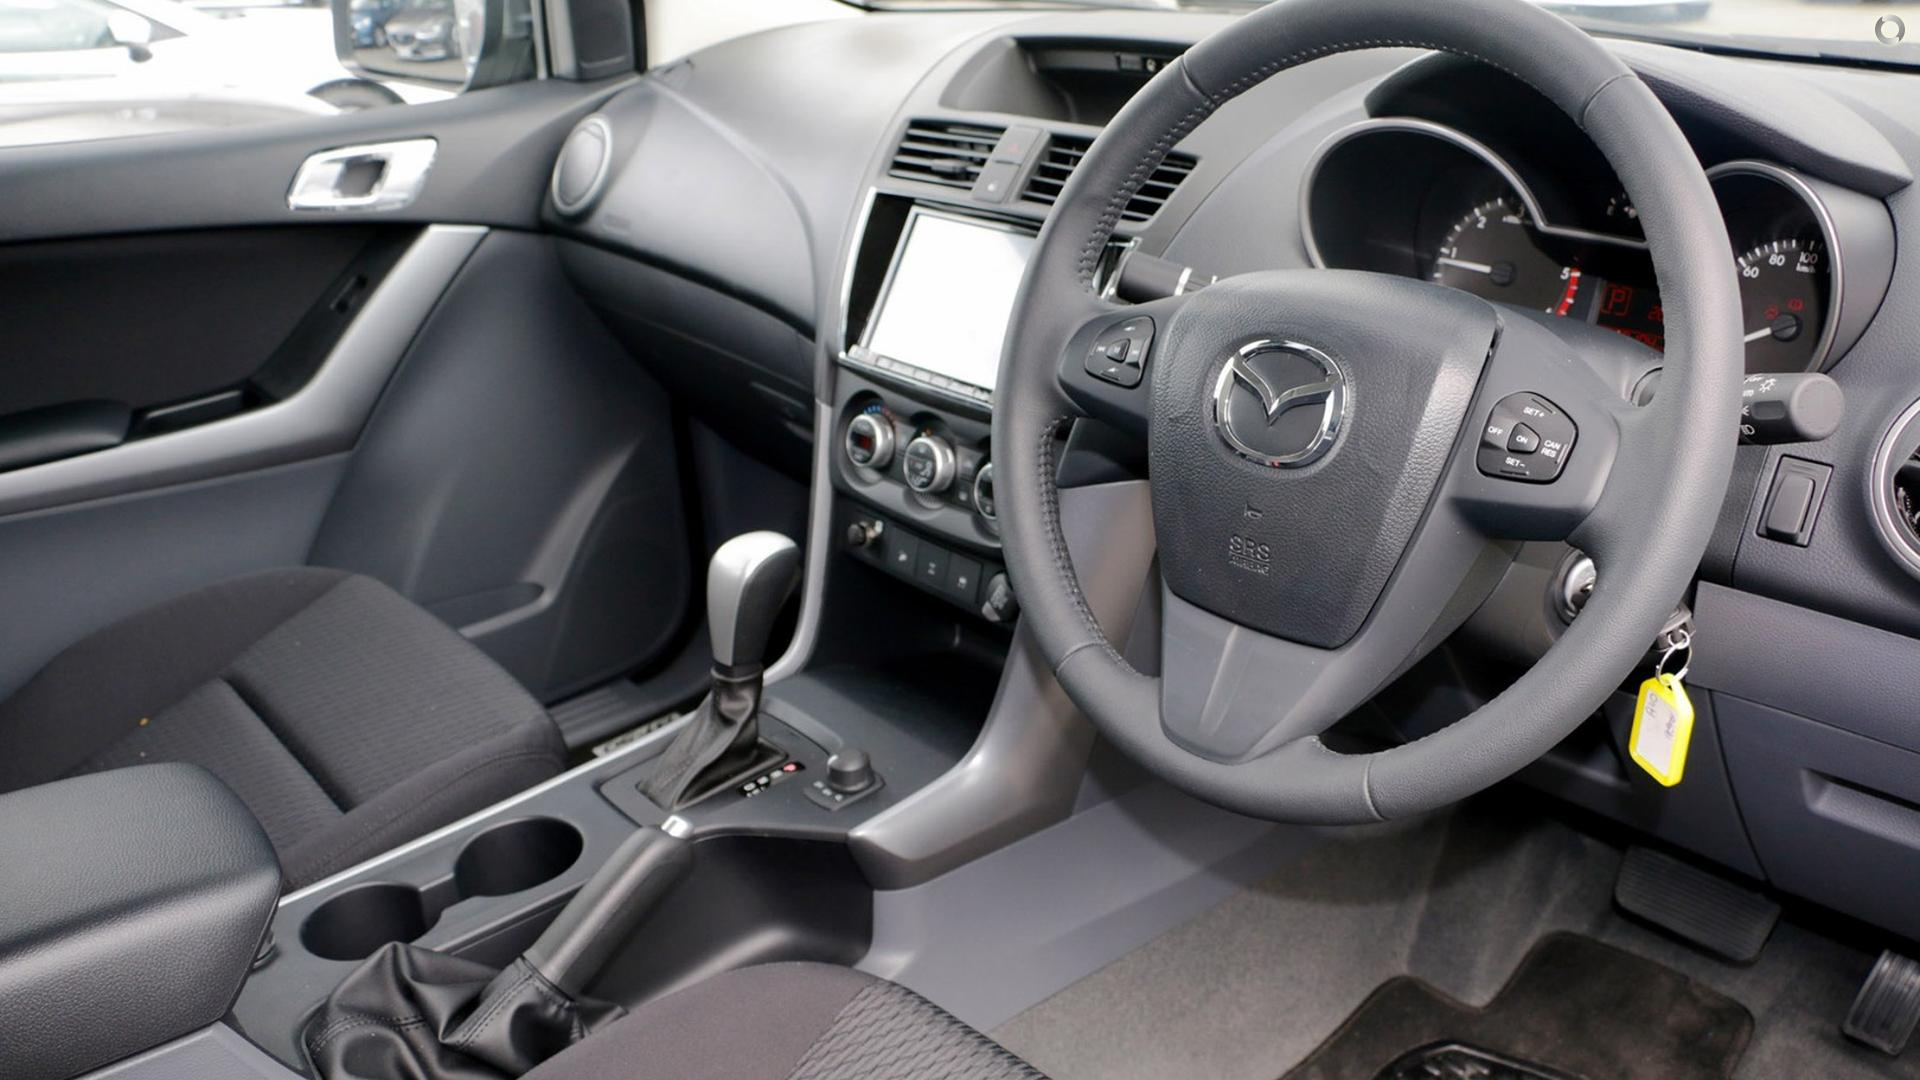 2018 Mazda Bt-50 Xtr